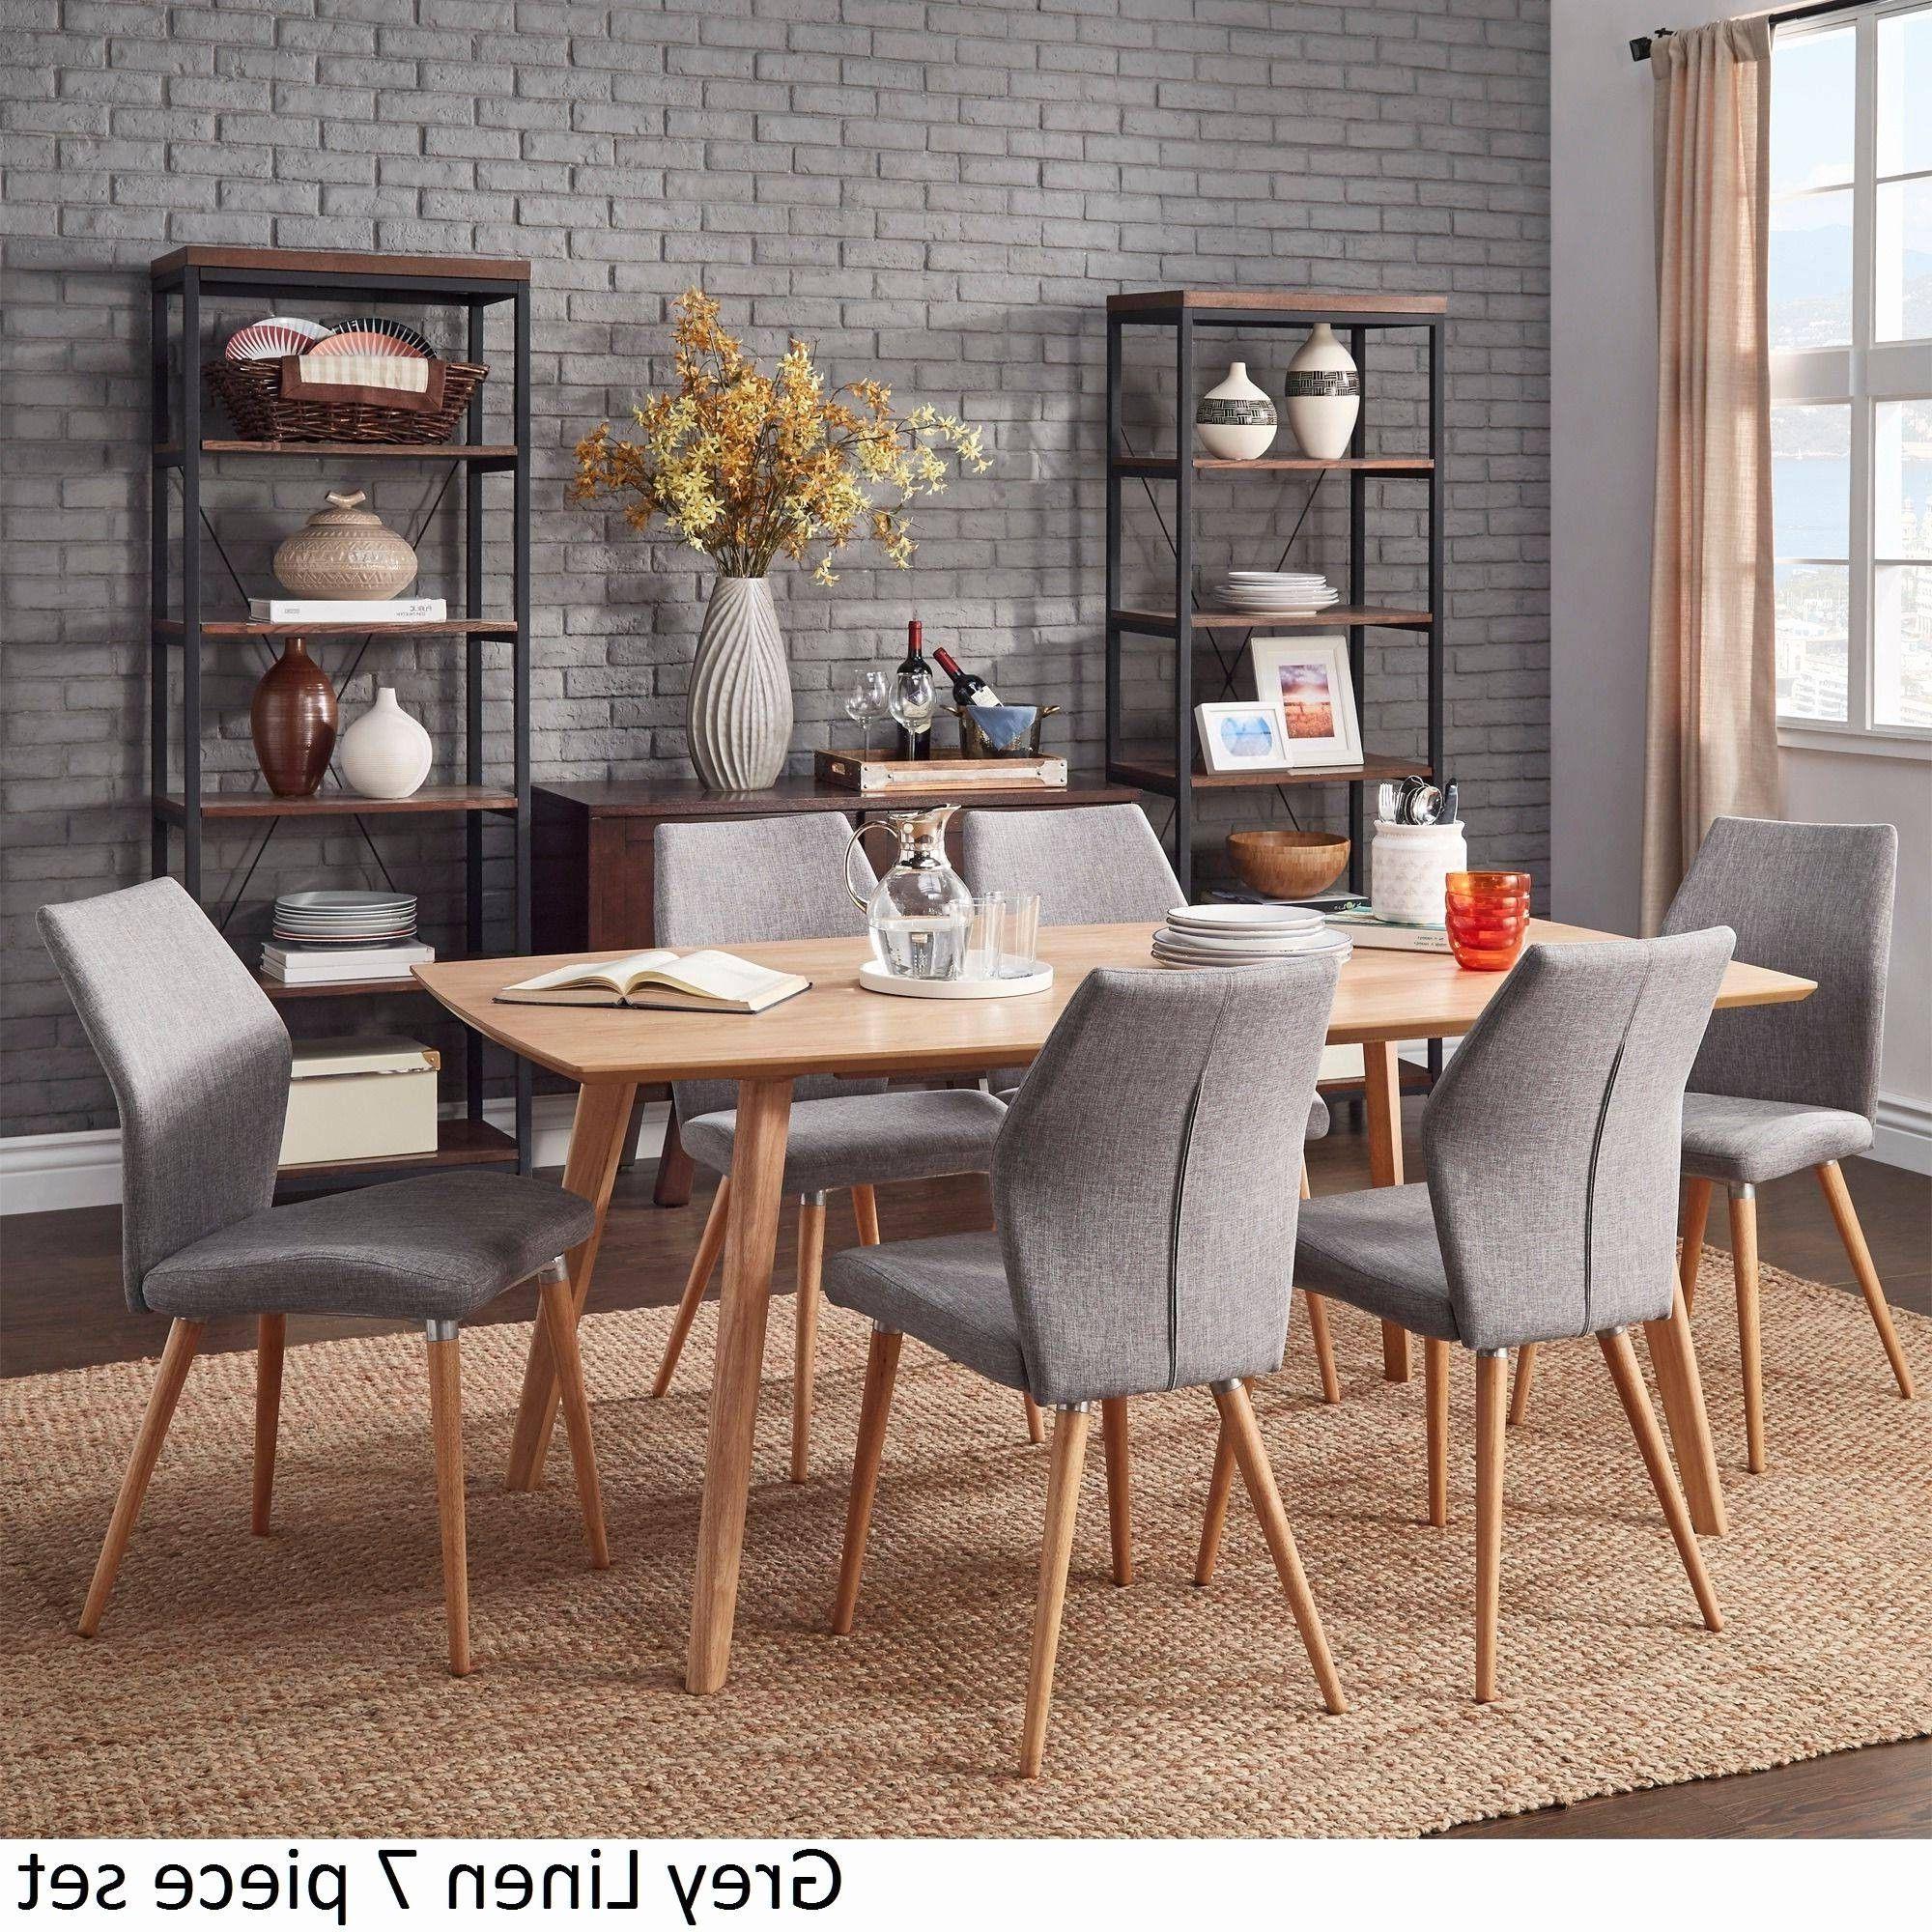 16+ Light grey dining room set Best Choice